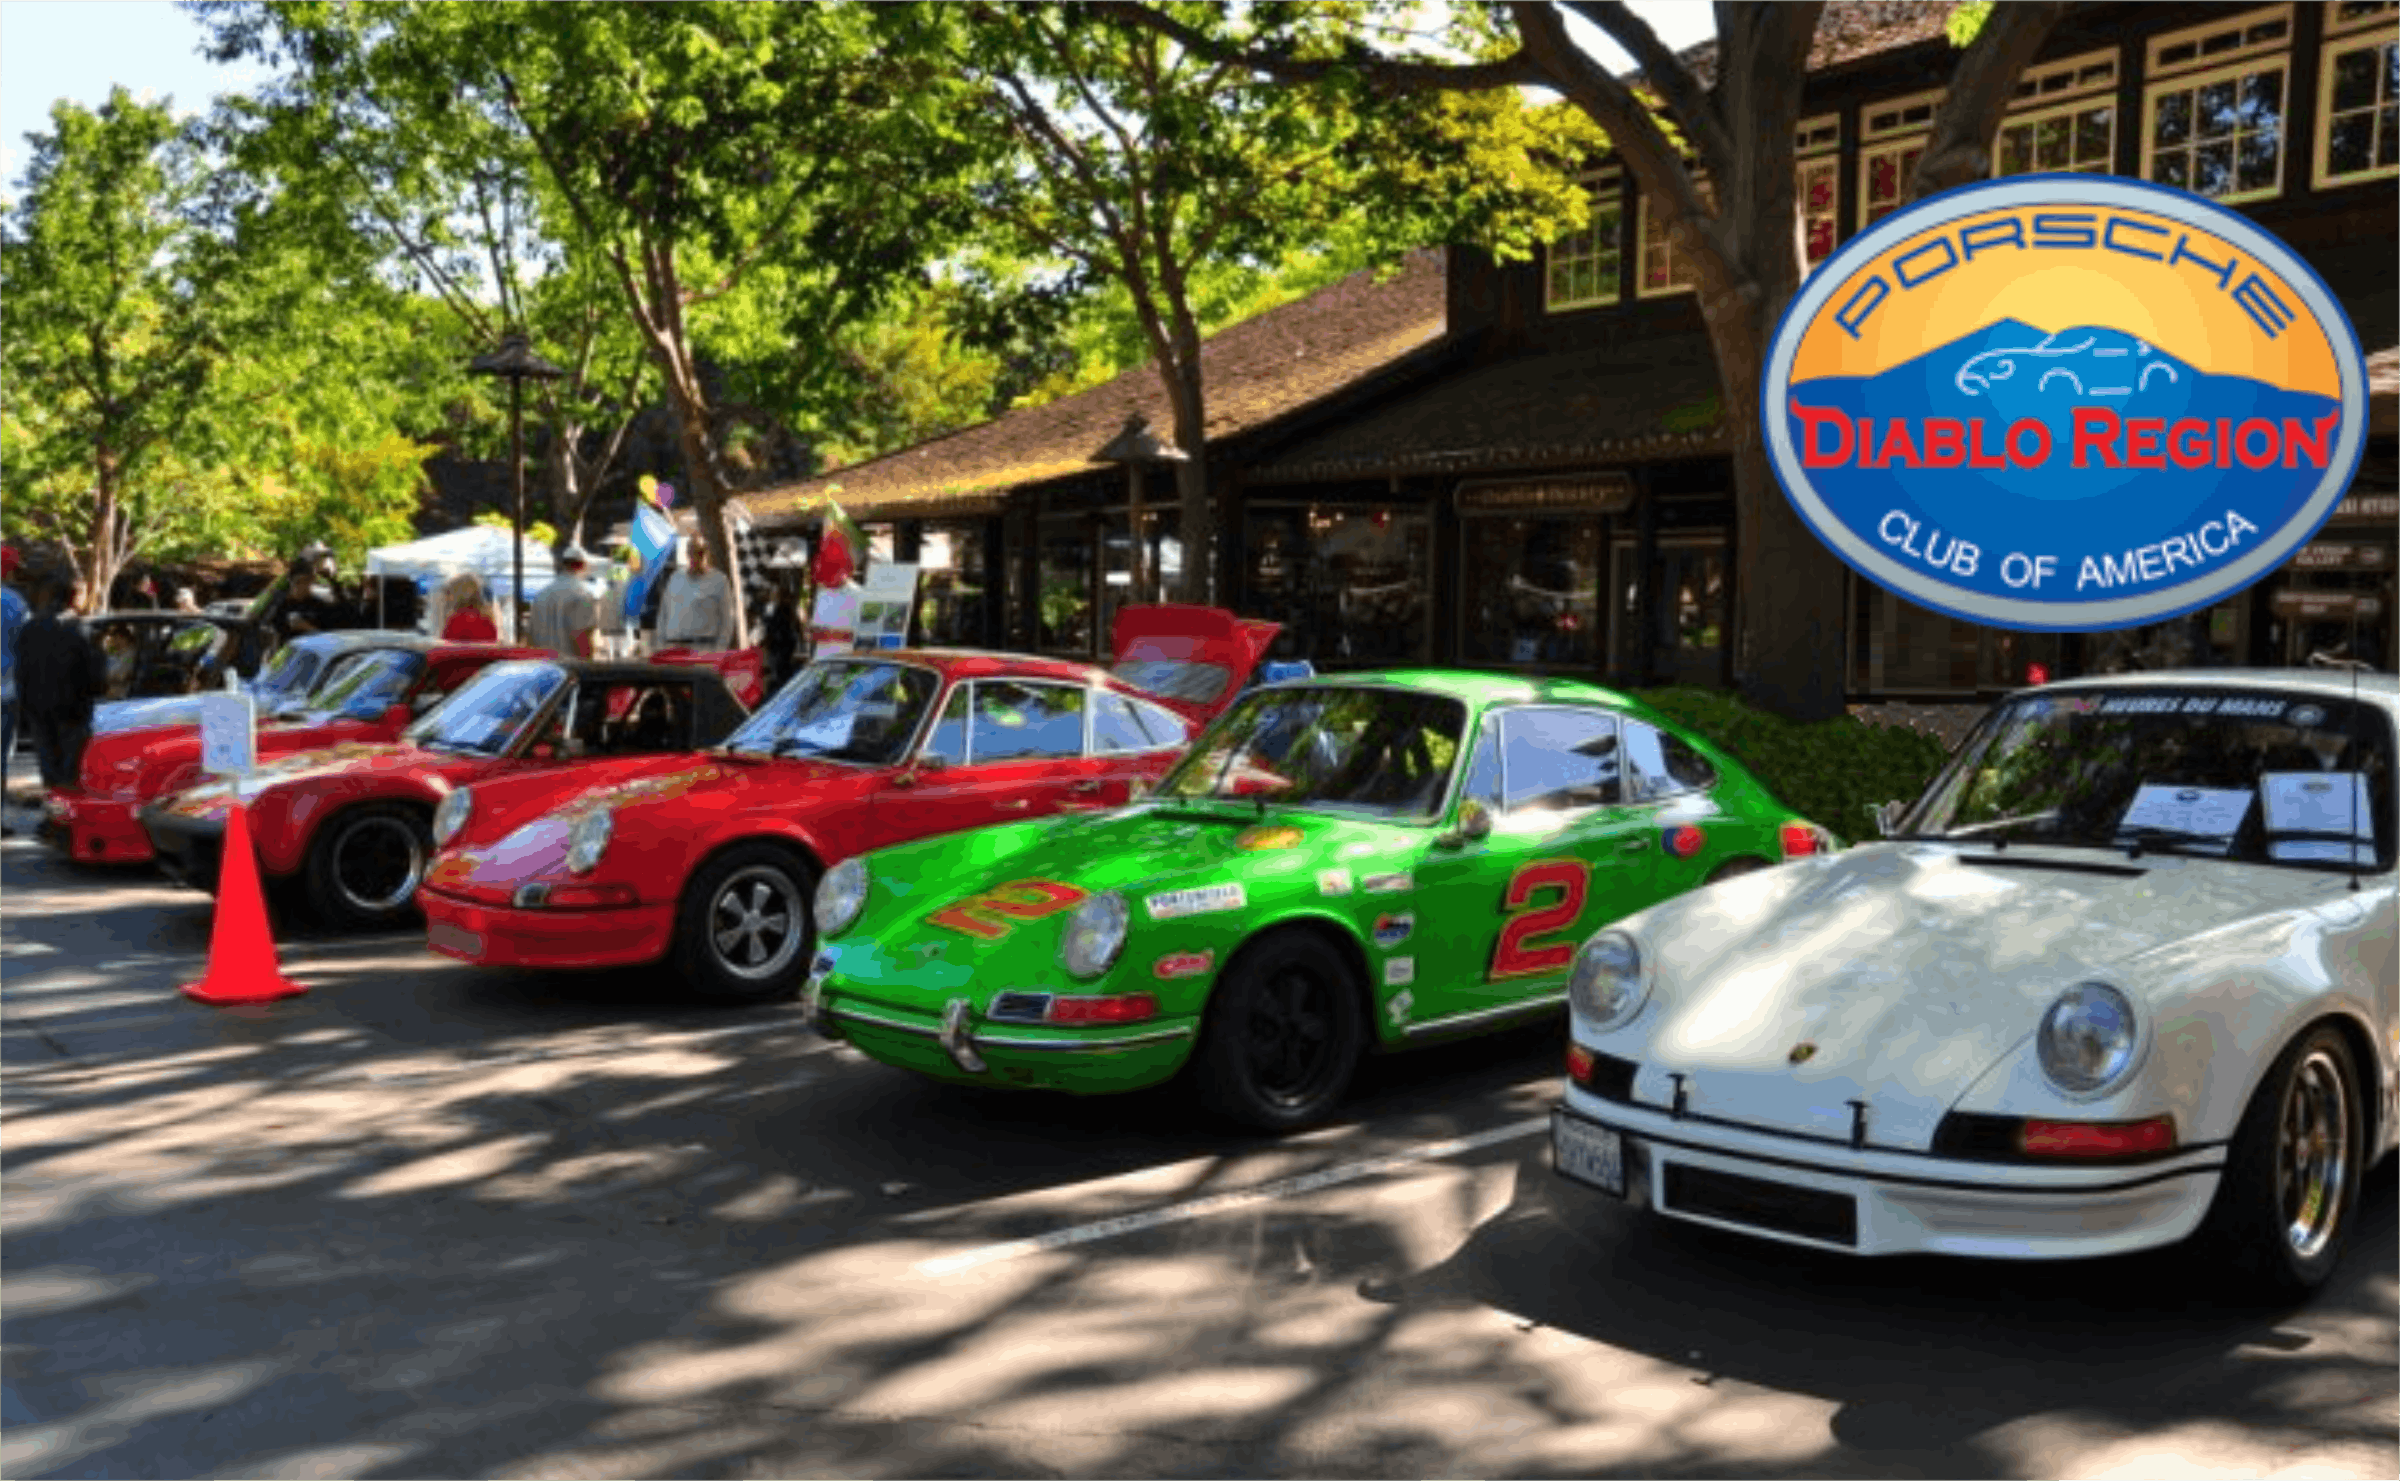 PCA Diablo Region 34th Annual Car Show at The Livery Shopping